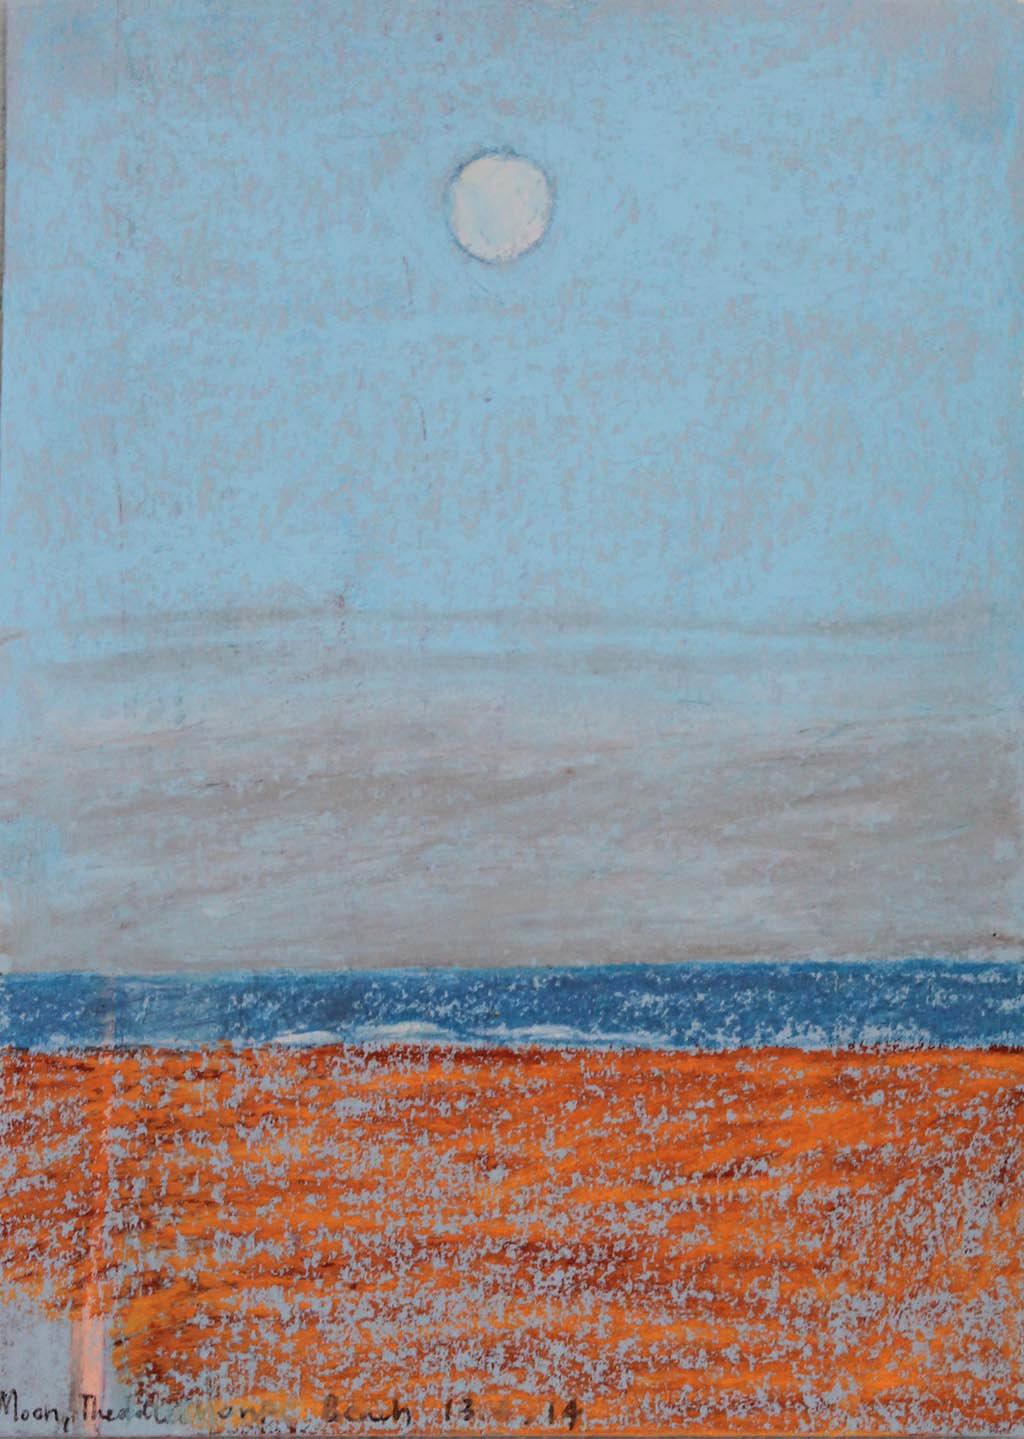 Moonrise At TheddlethorpeBeach.jpg